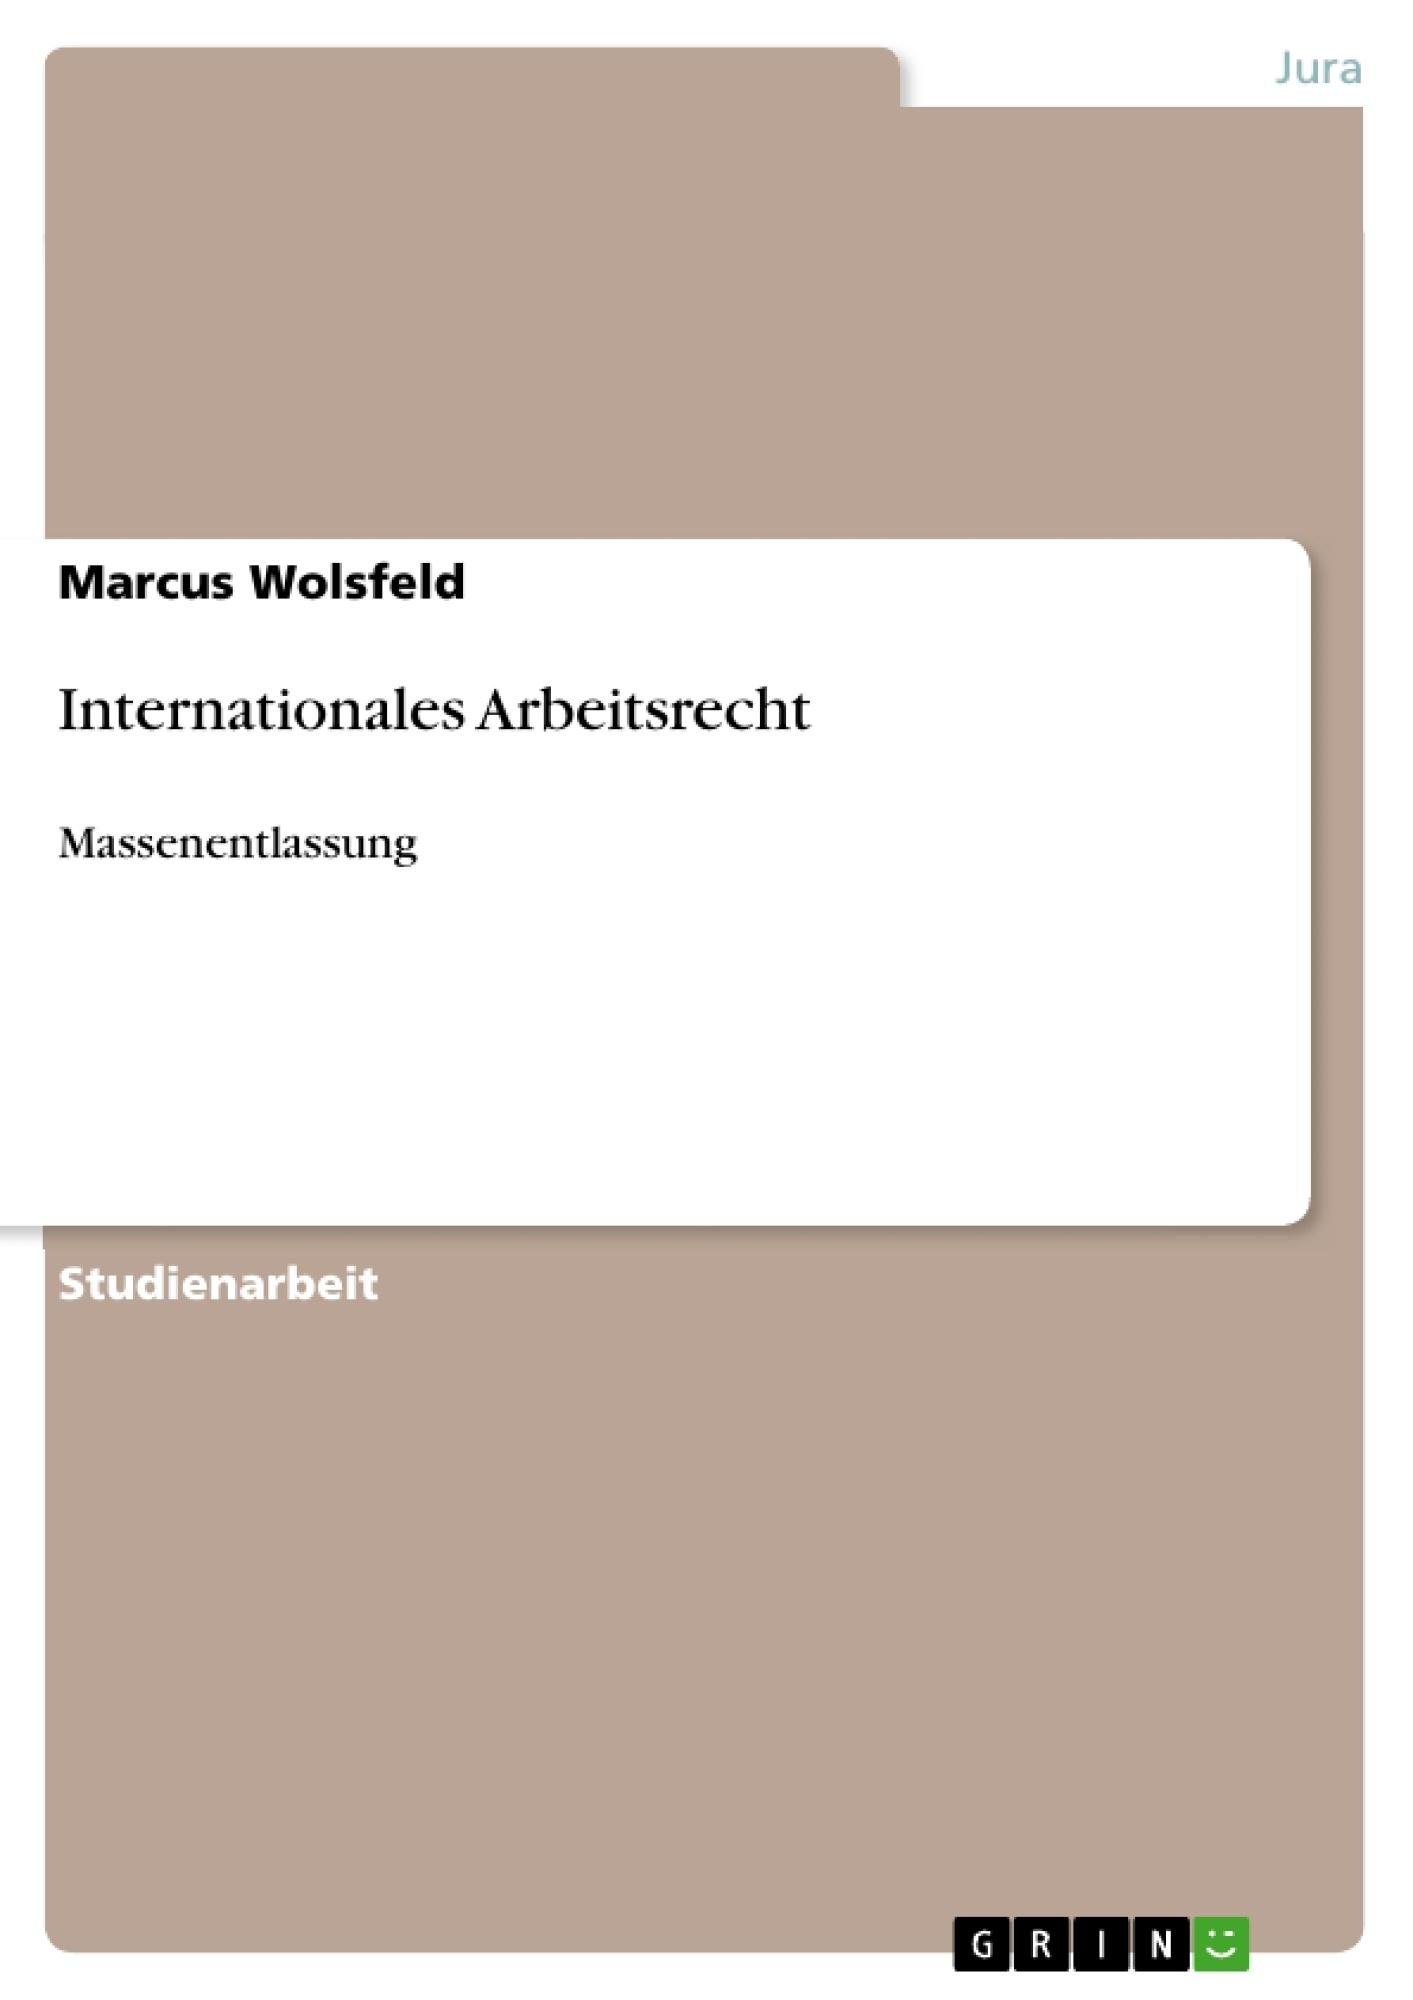 Titel: Internationales Arbeitsrecht